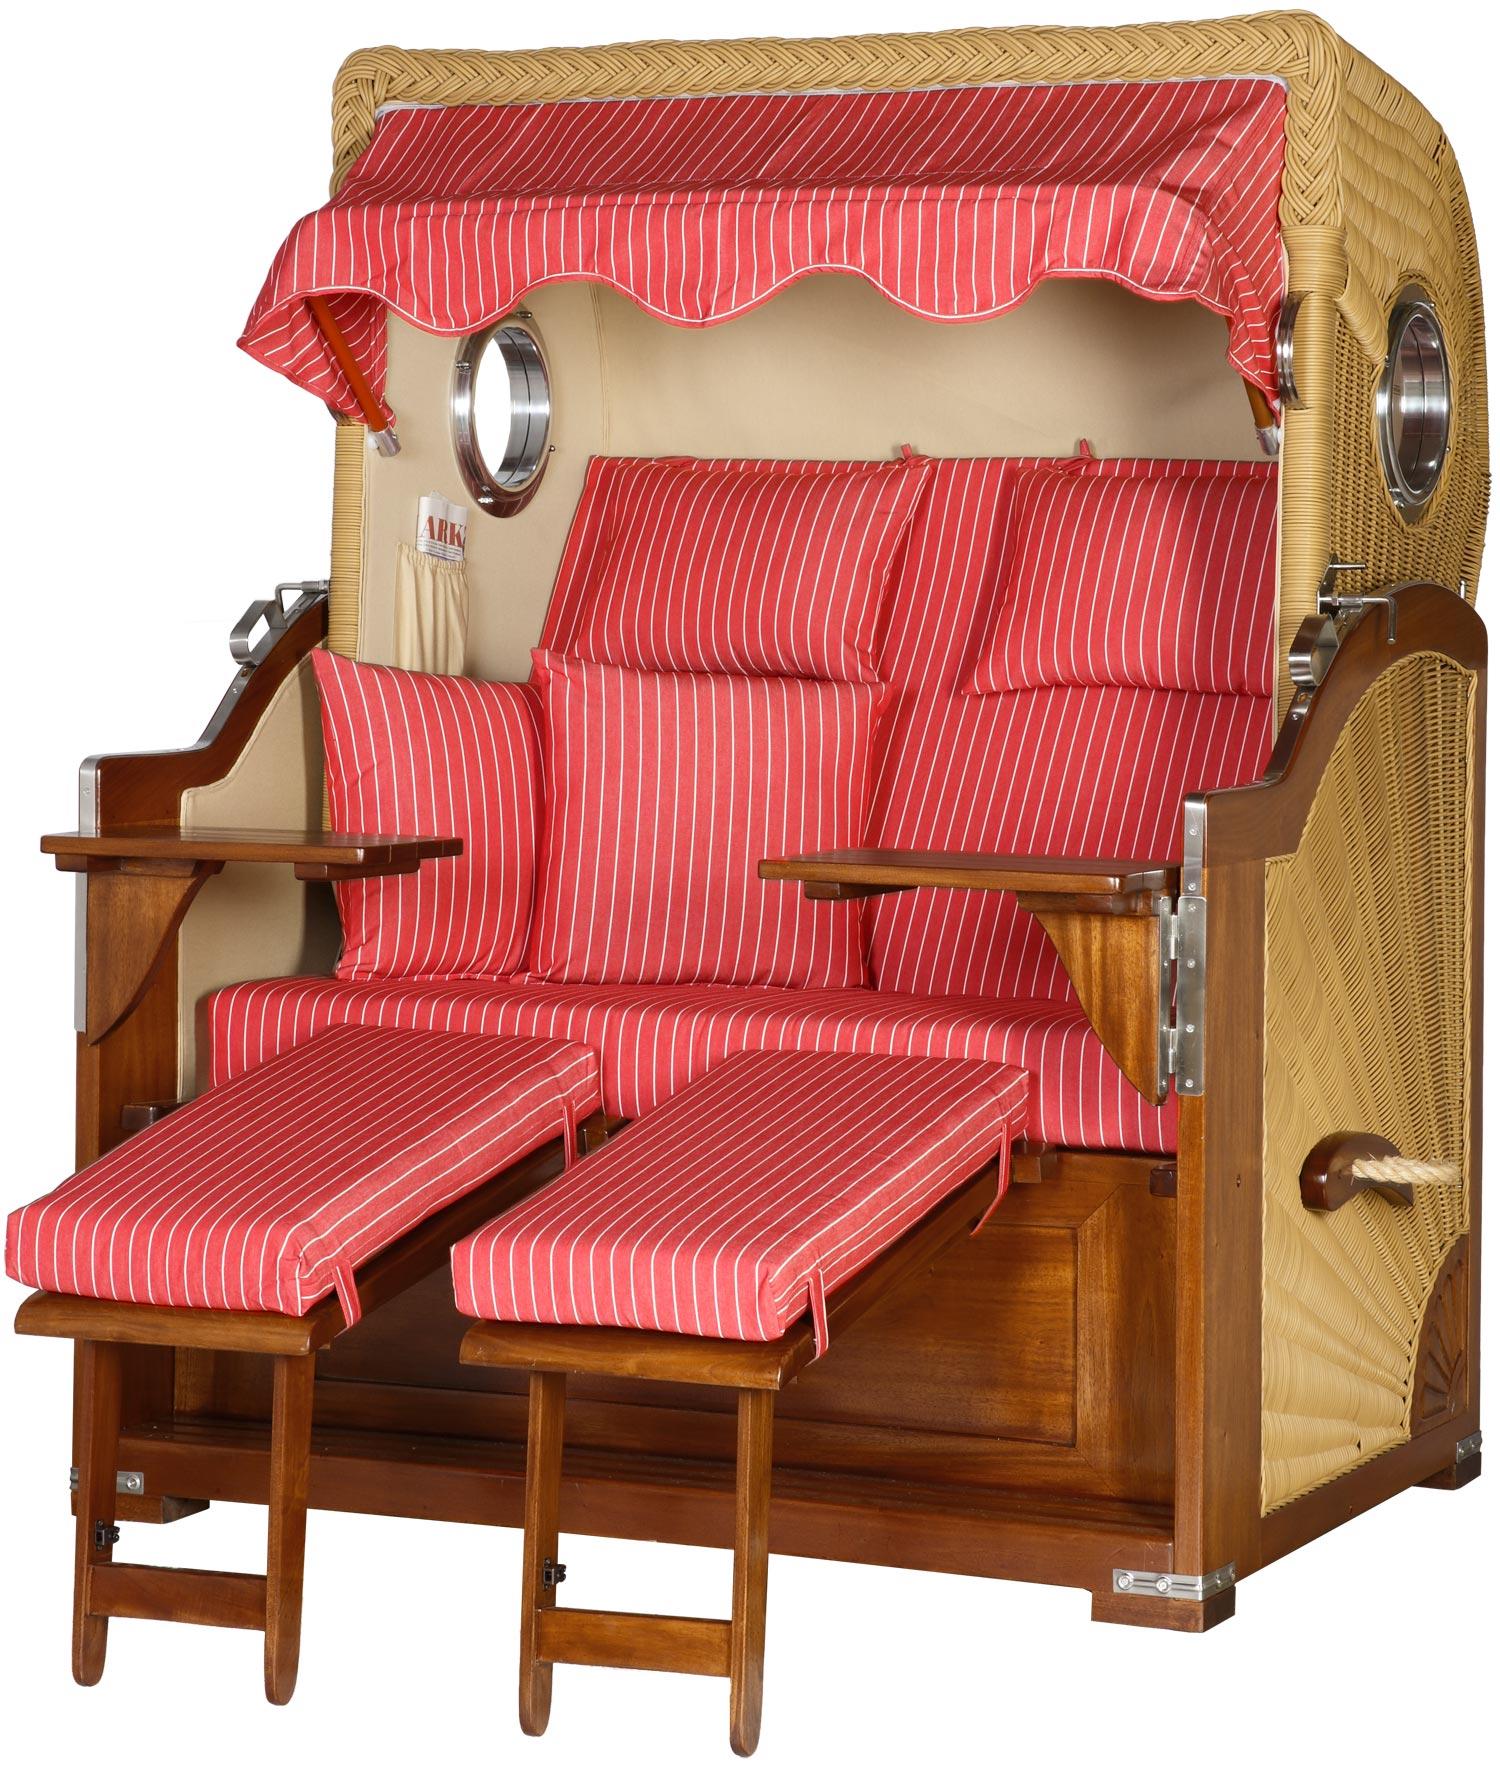 strandkorb preis leistung rugbyclubeemland. Black Bedroom Furniture Sets. Home Design Ideas